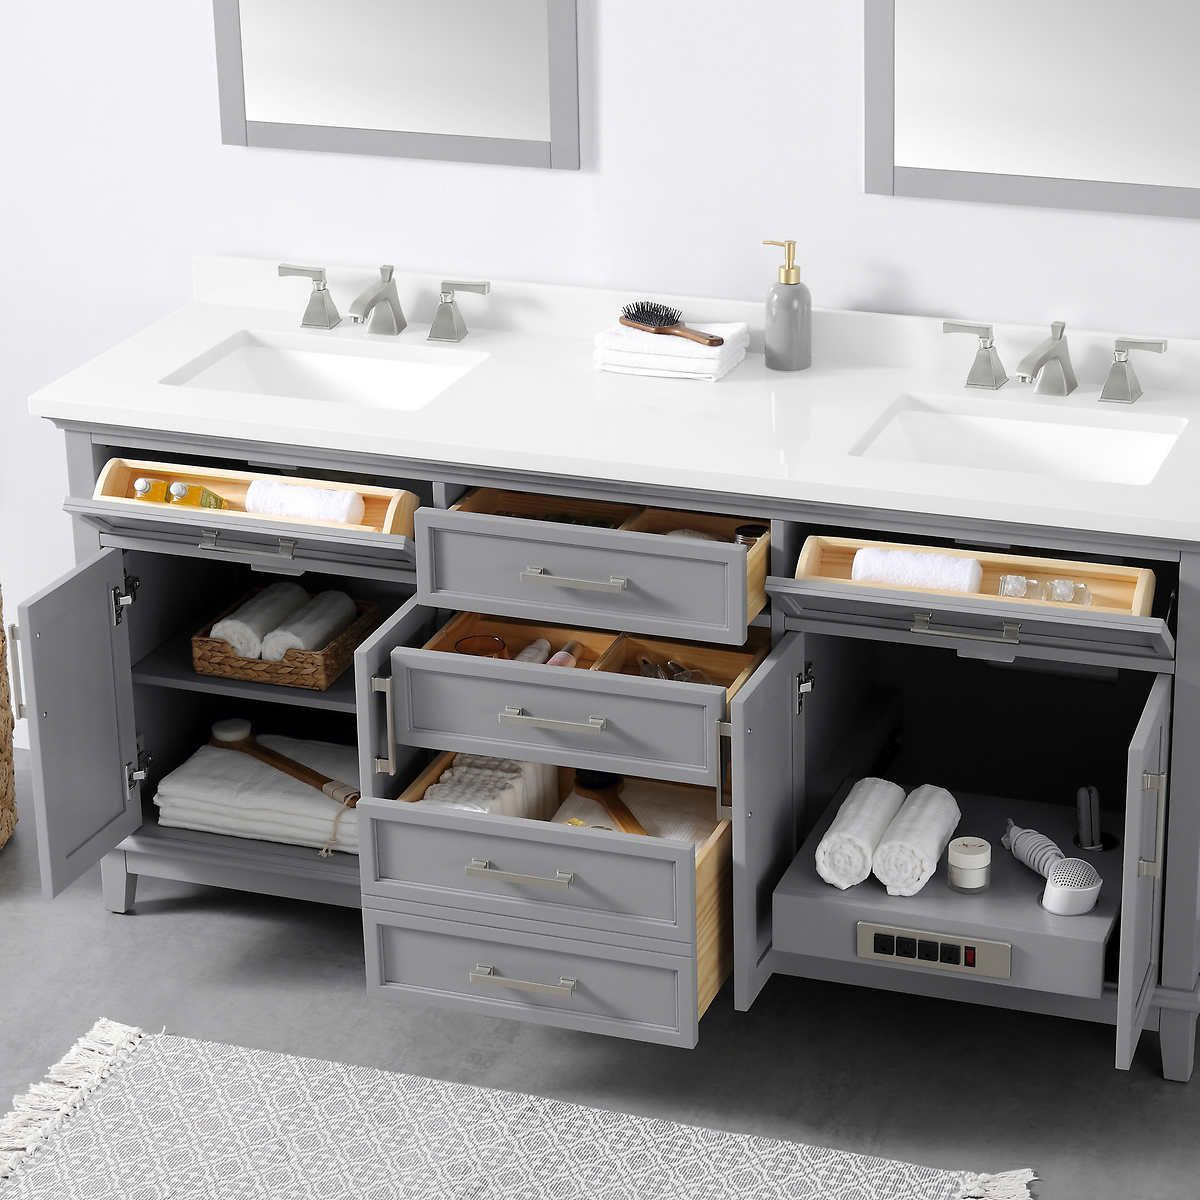 Ove Decors Dylan 72 Bath Vanity In 2021 Bath Vanities Vanity Modern Bathroom Vanity